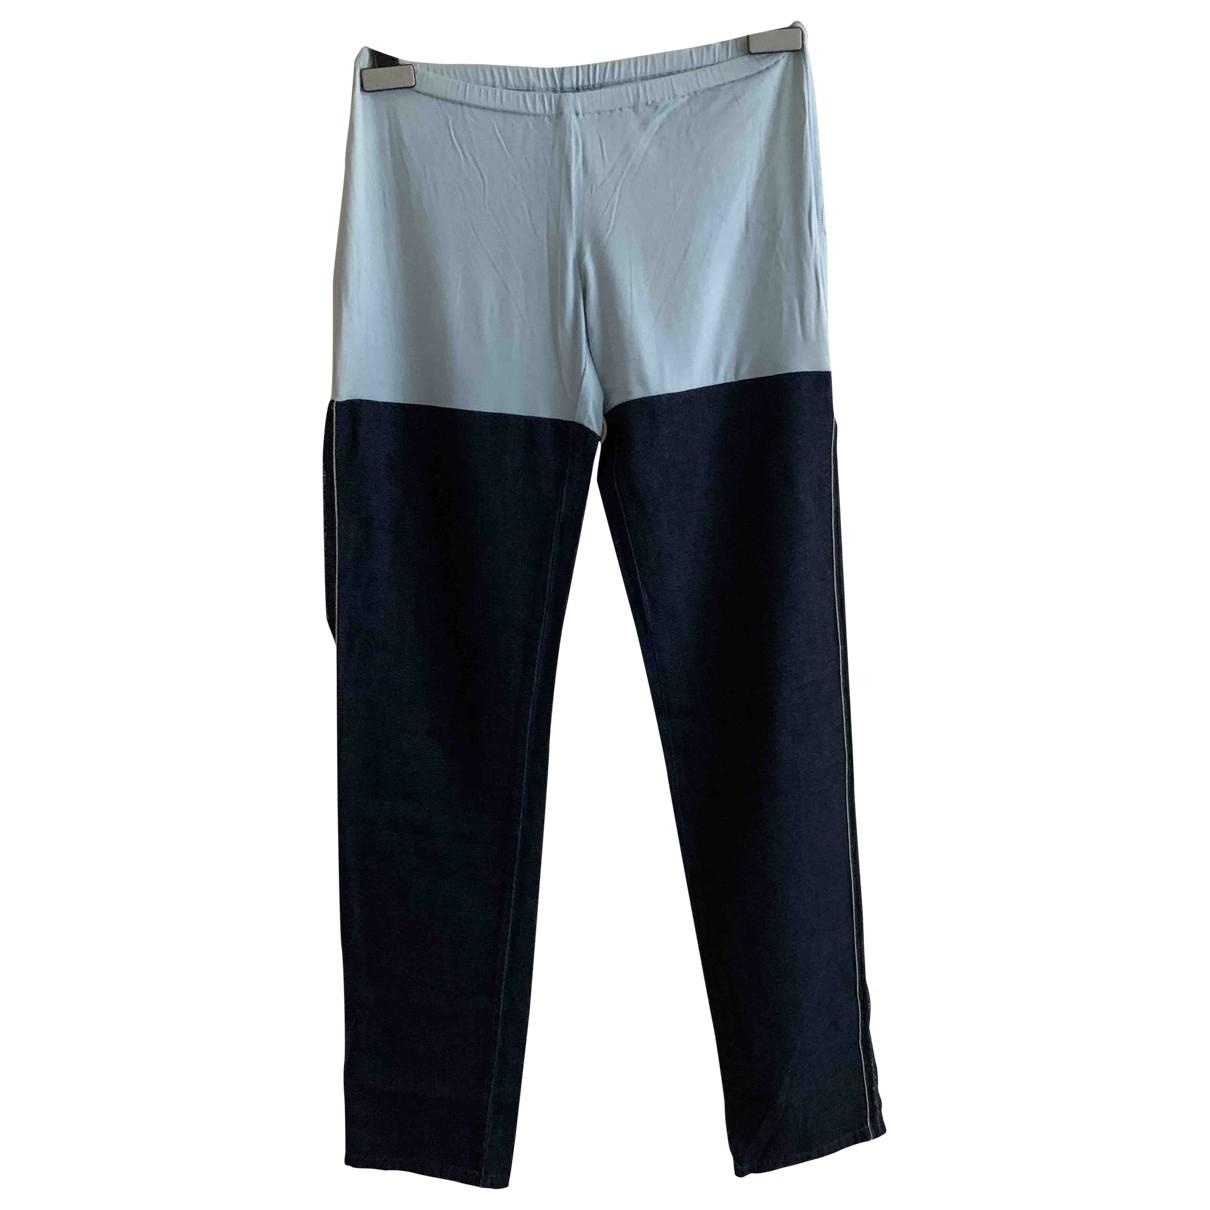 Maison Martin Margiela \N Denim - Jeans Trousers for Women 40 IT